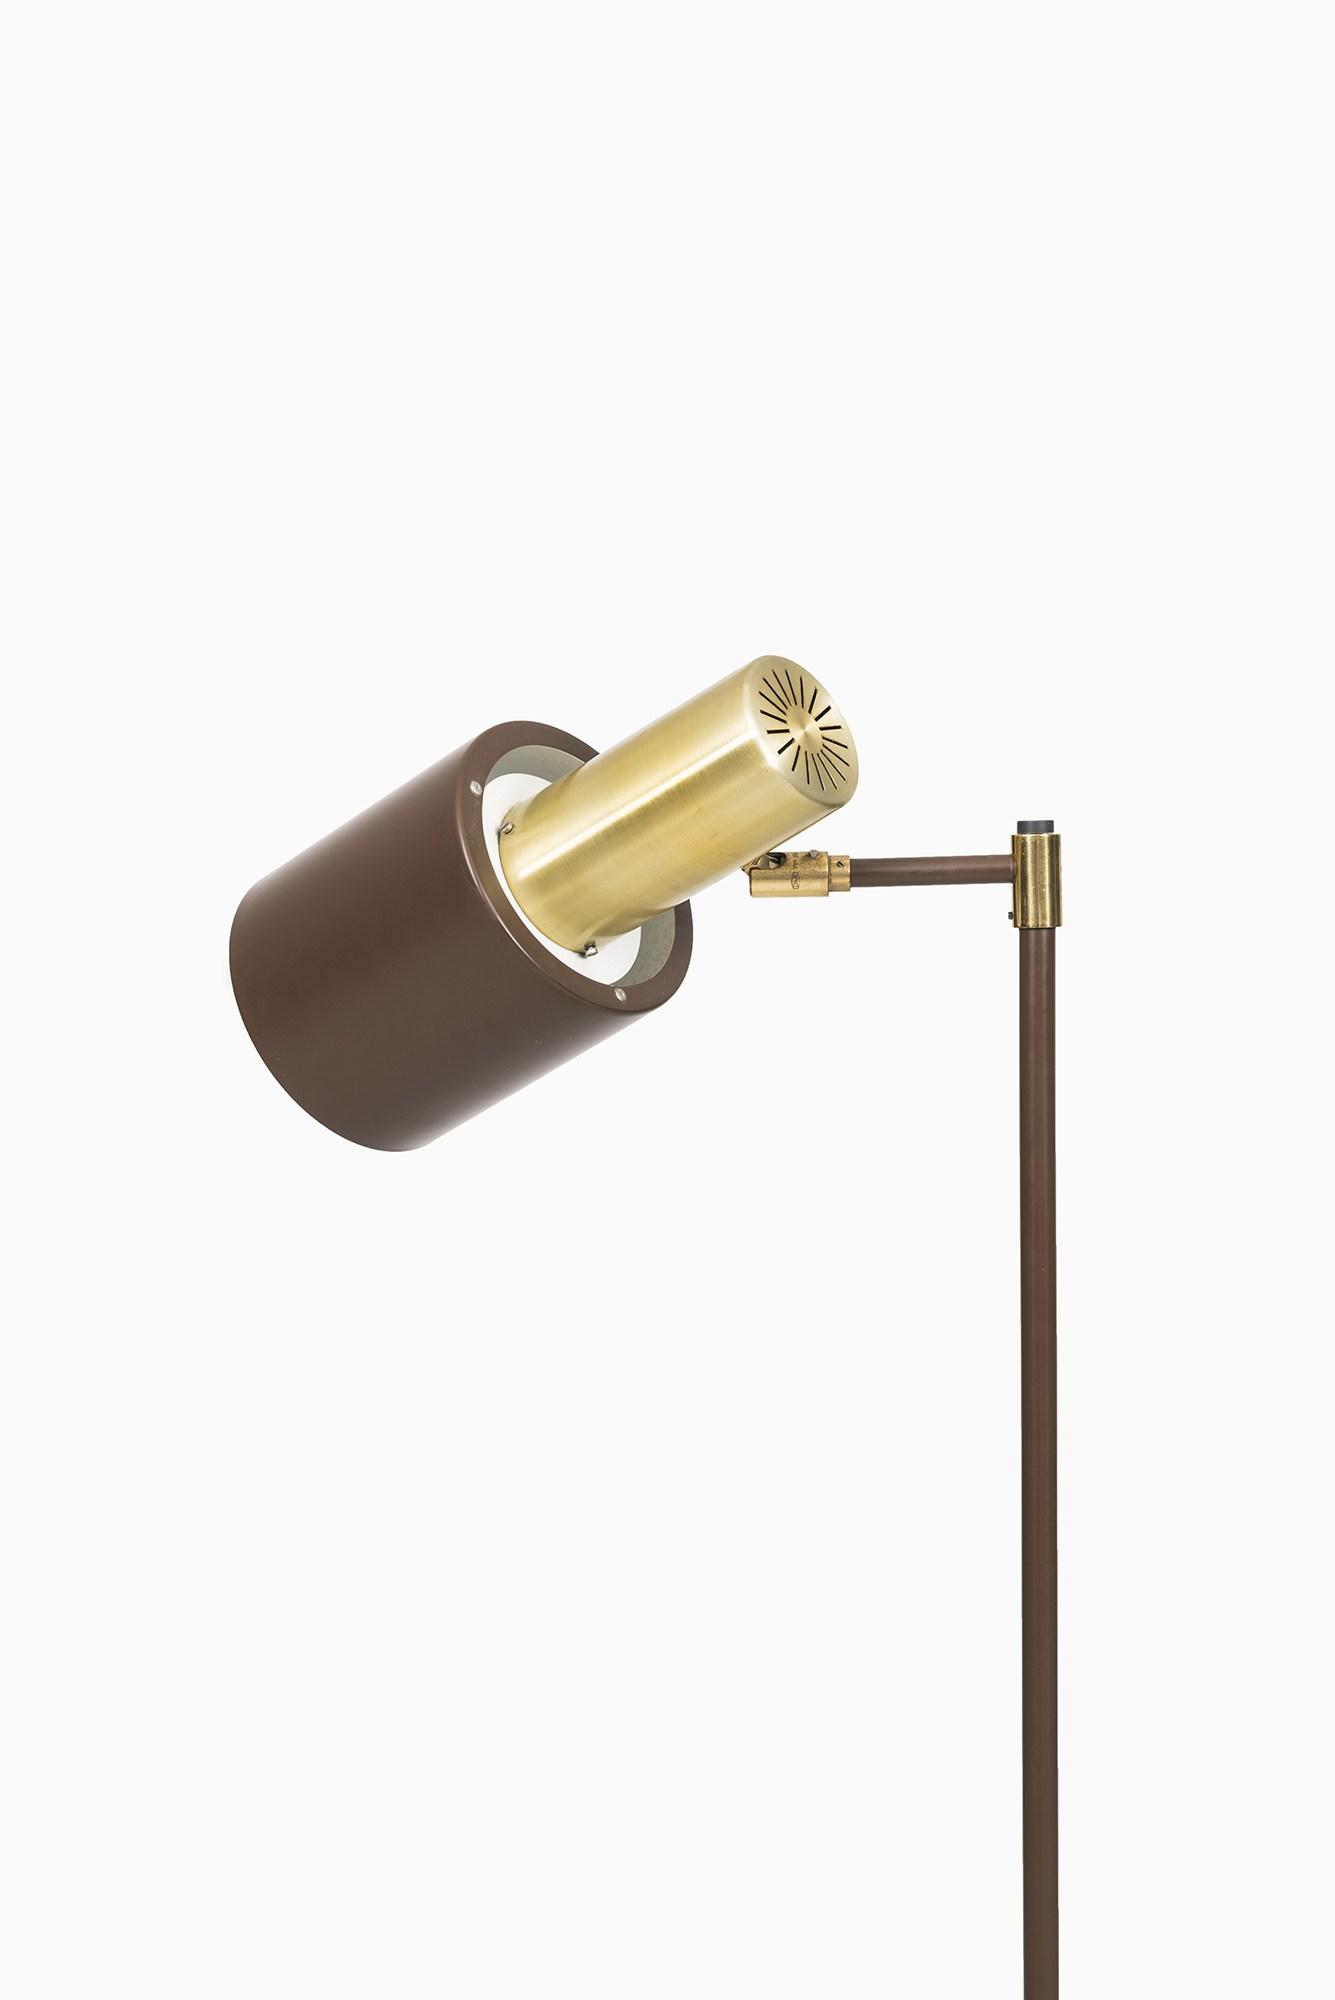 Studio Standerlampe u2013 gulvlampe Jo Hammerborg Fog& Morup u2013 retro design dk